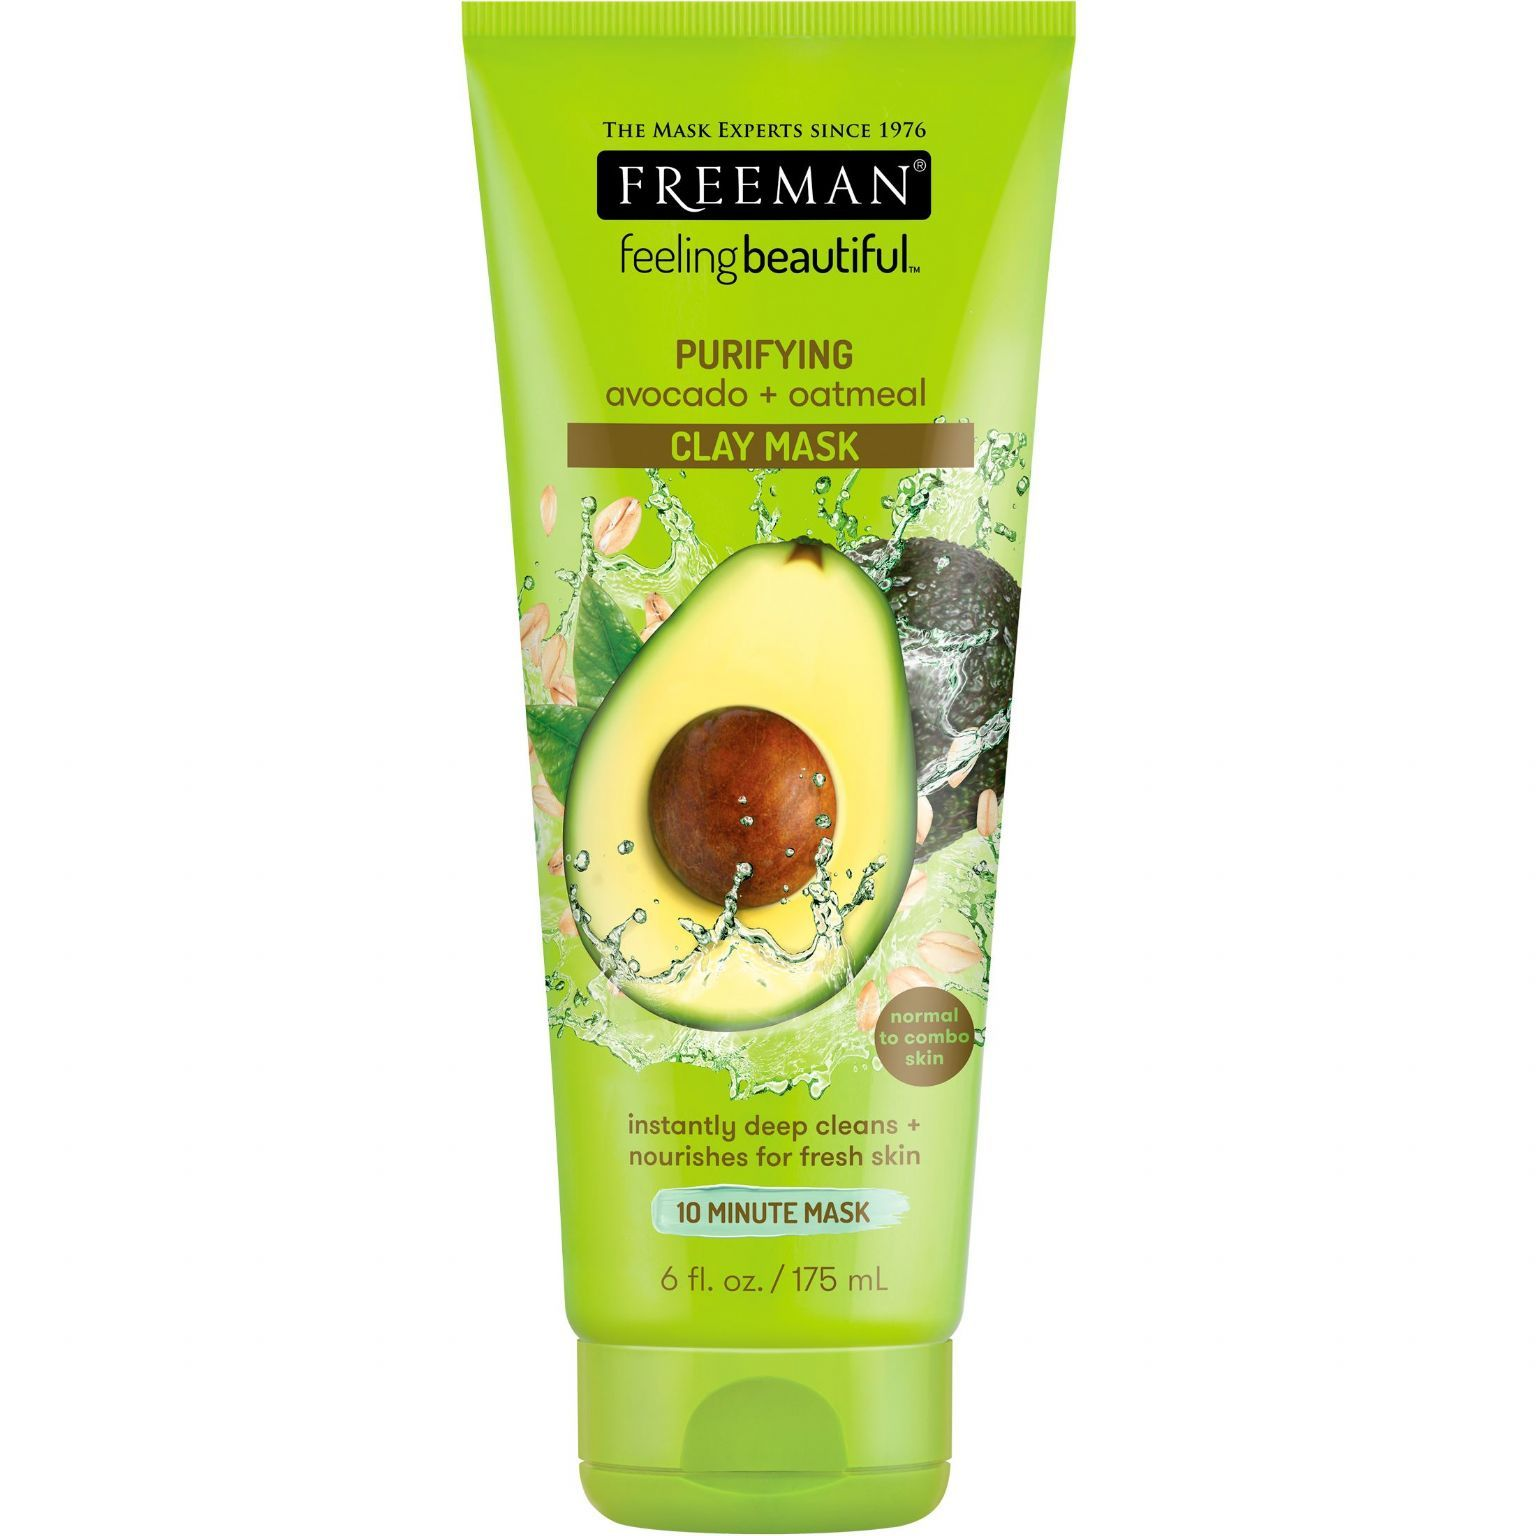 Feeling Beautiful Purifying Avocado + Oatmeal Clay Mask